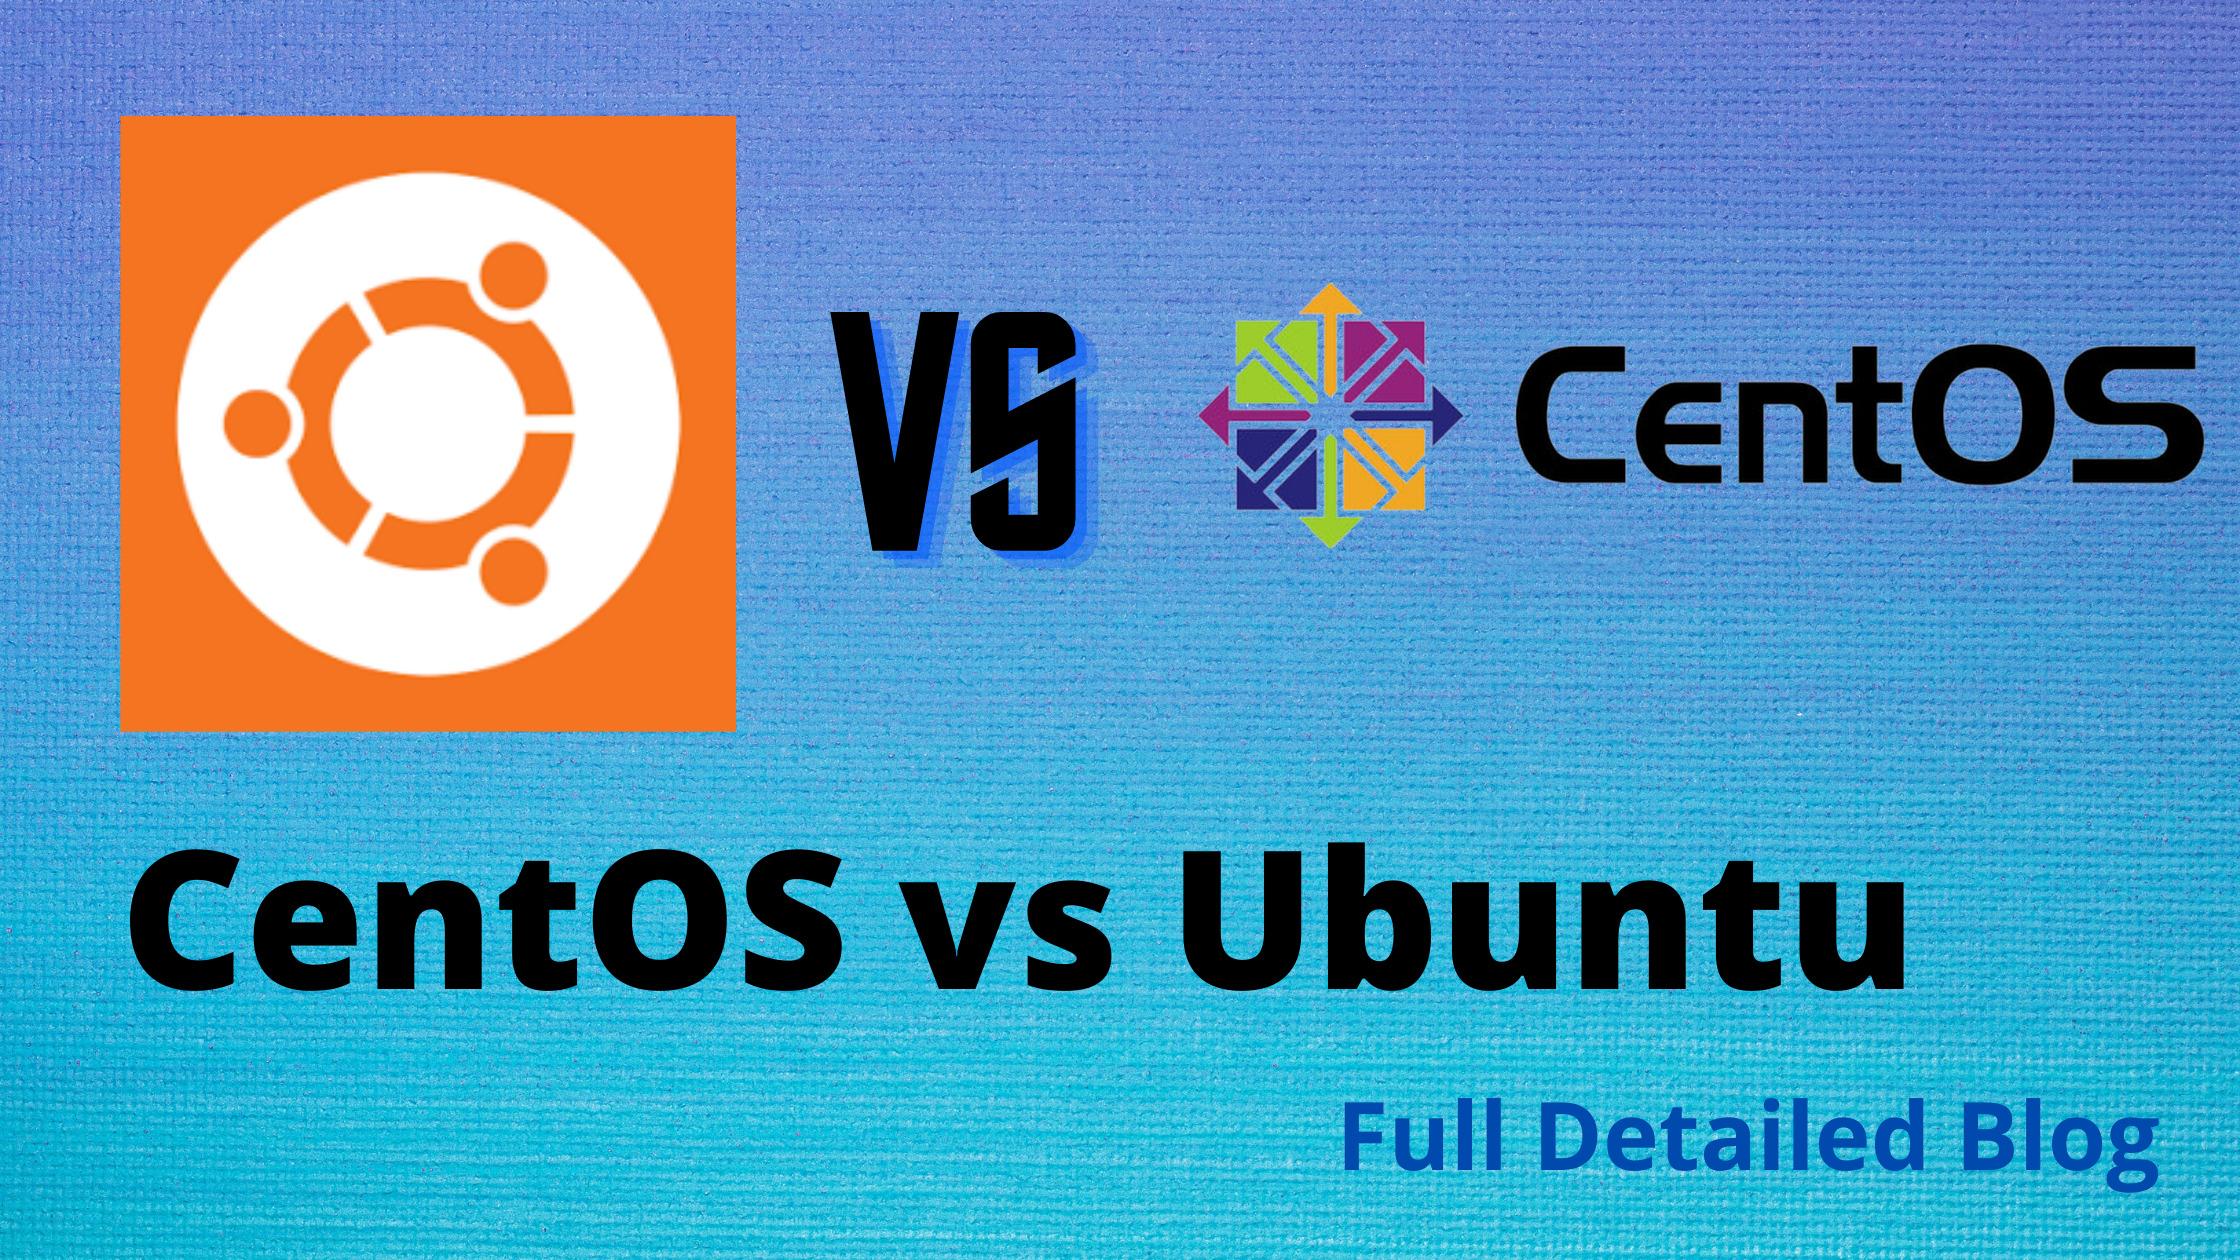 CentOS vs Ubuntu